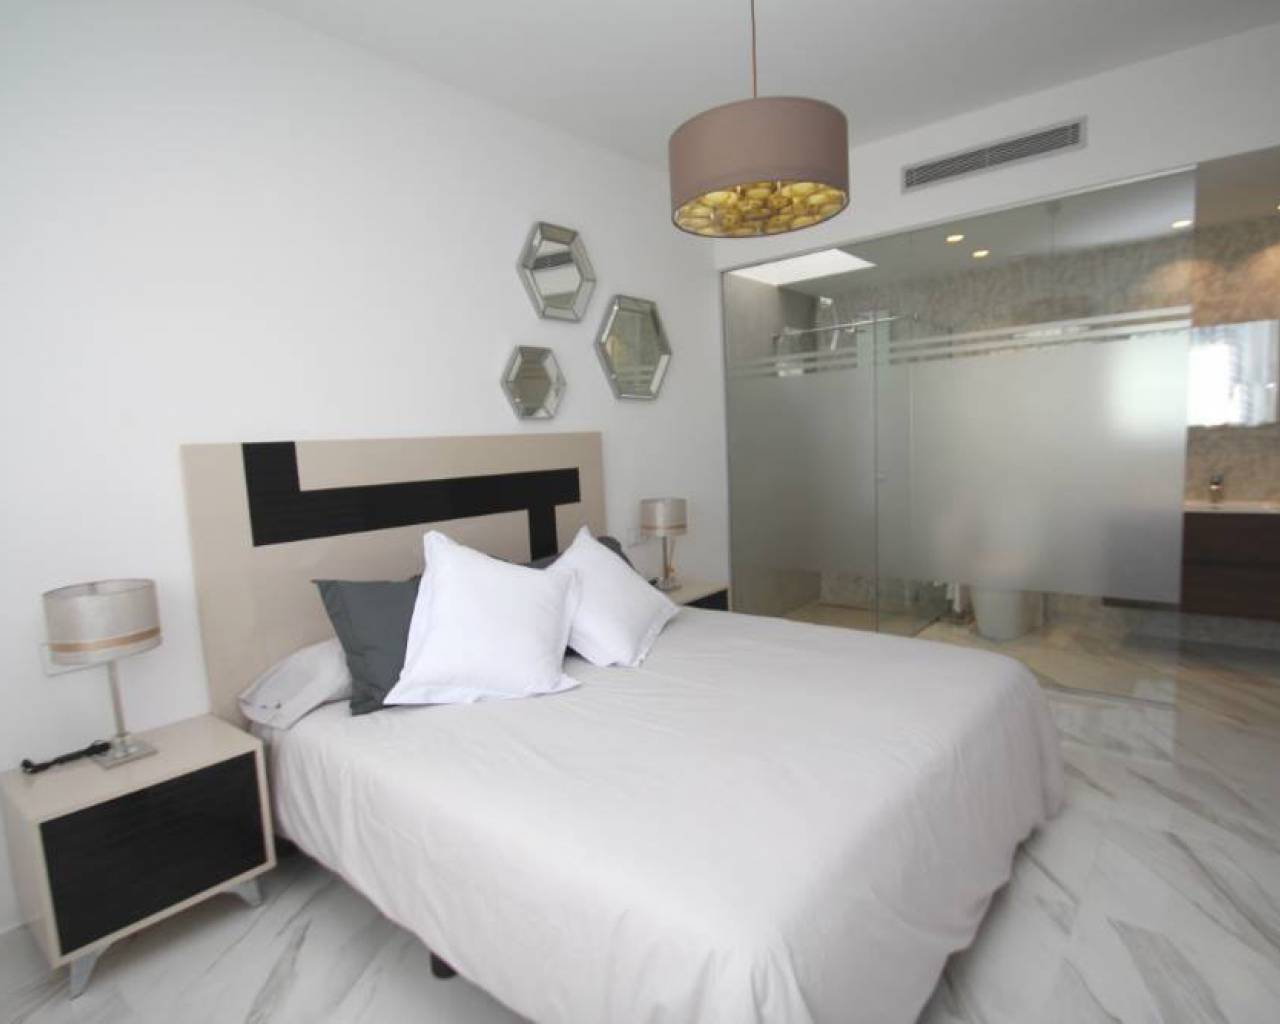 nieuwbouw-appartement-san-miguel-de-salinas_321_xl